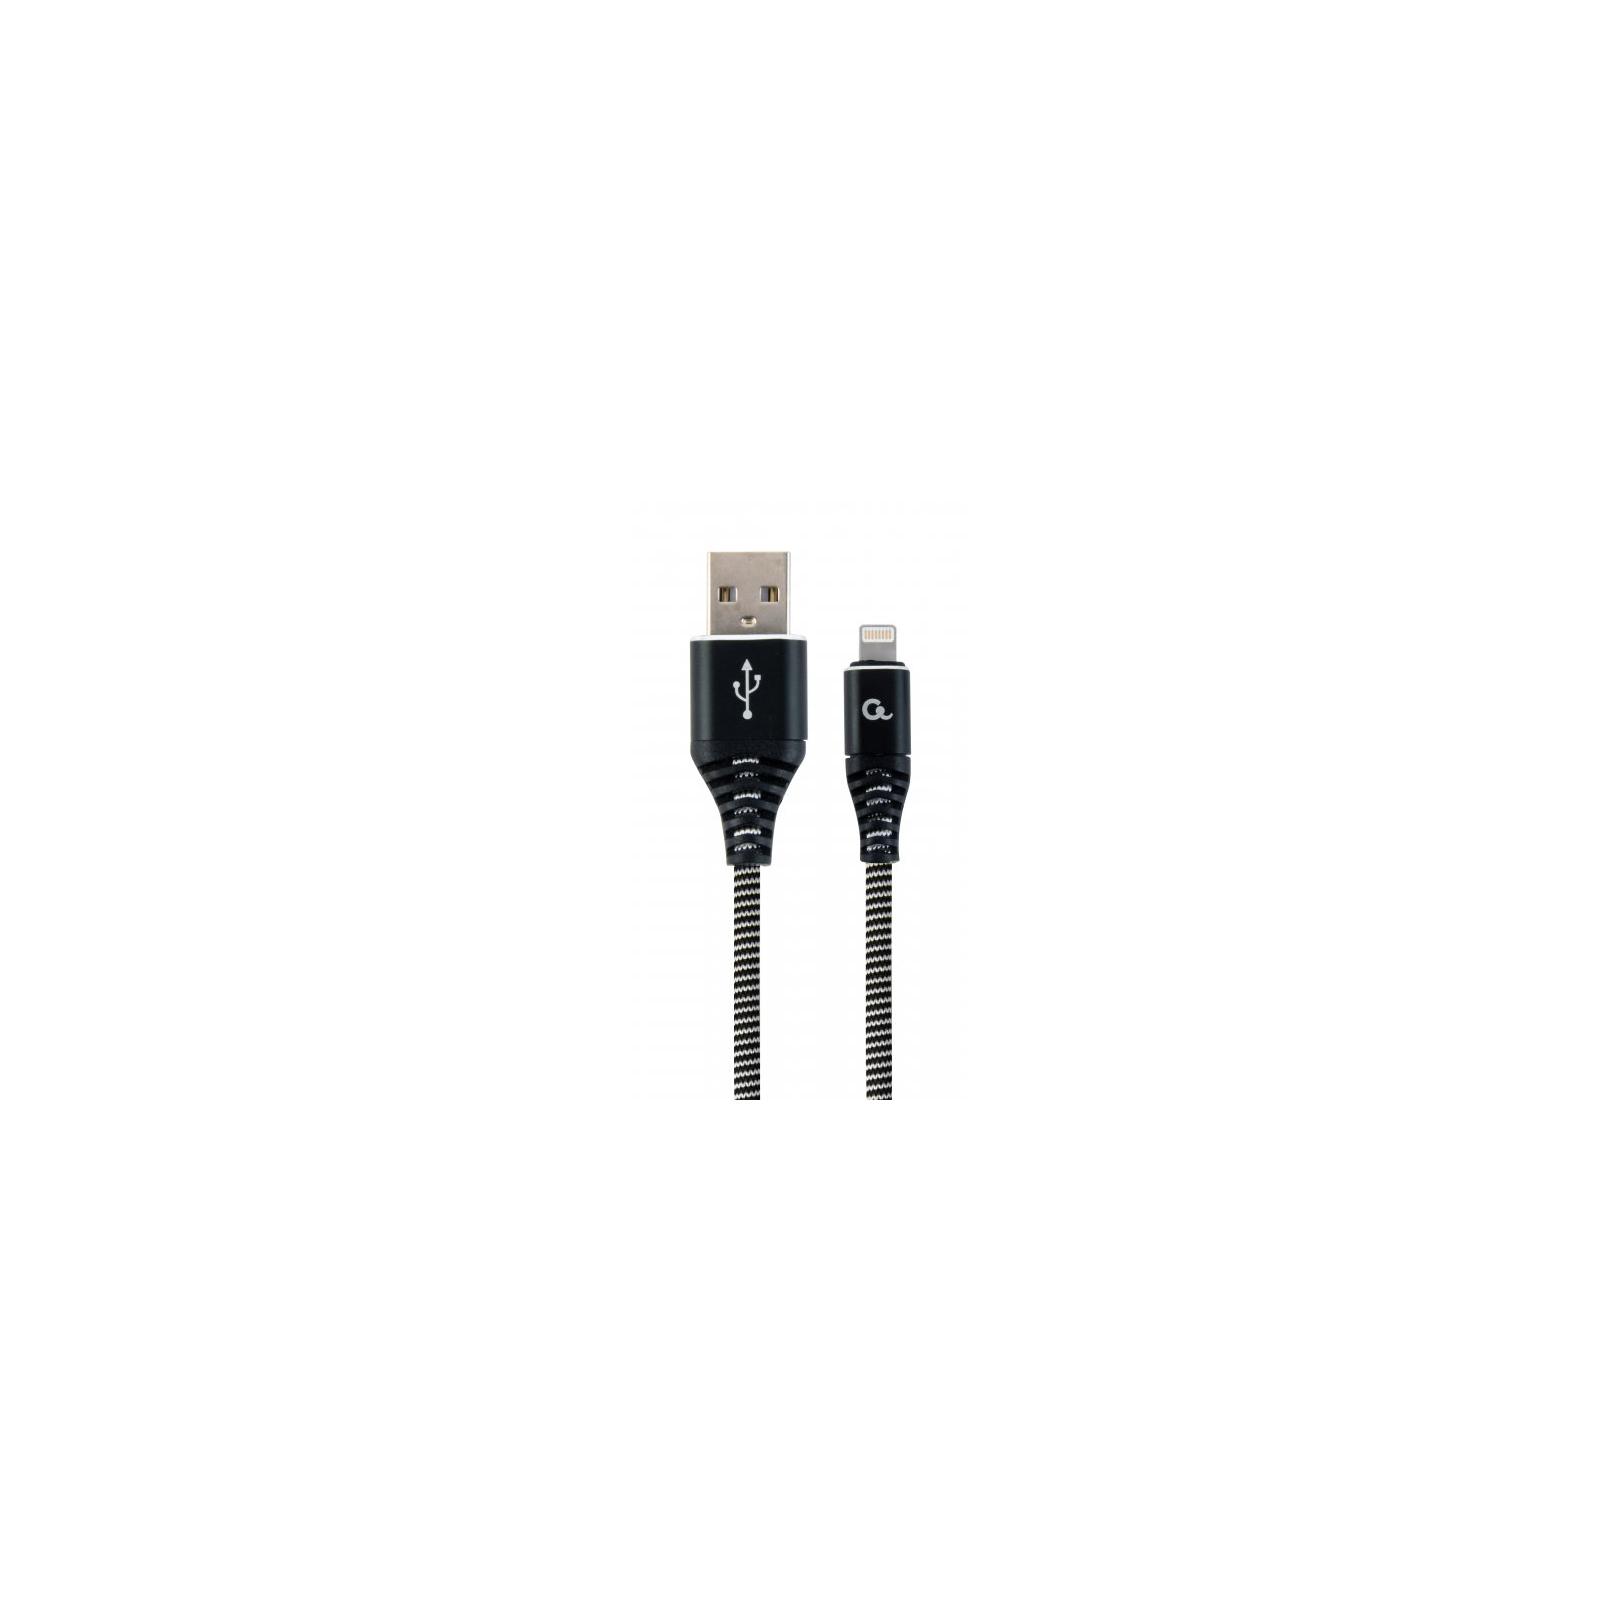 Дата кабель USB 2.0 AM to Type-C 1.0m Cablexpert (CC-USB2B-AMCM-1M-BW)